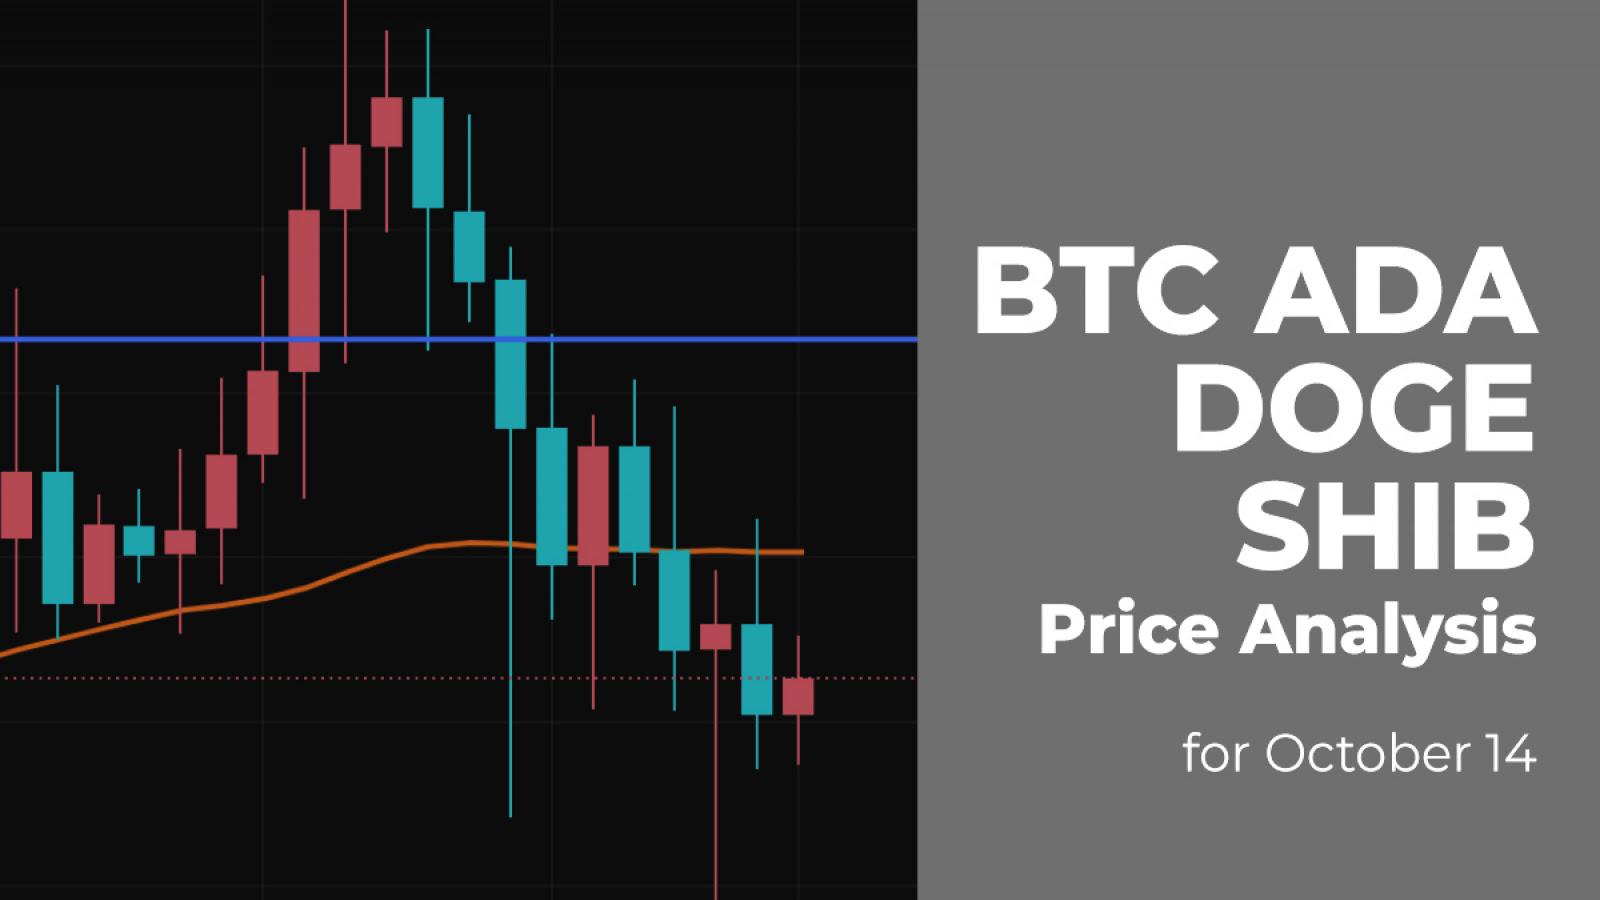 BTC, ADA, DOGE and SHIB Price Analysis for October 14